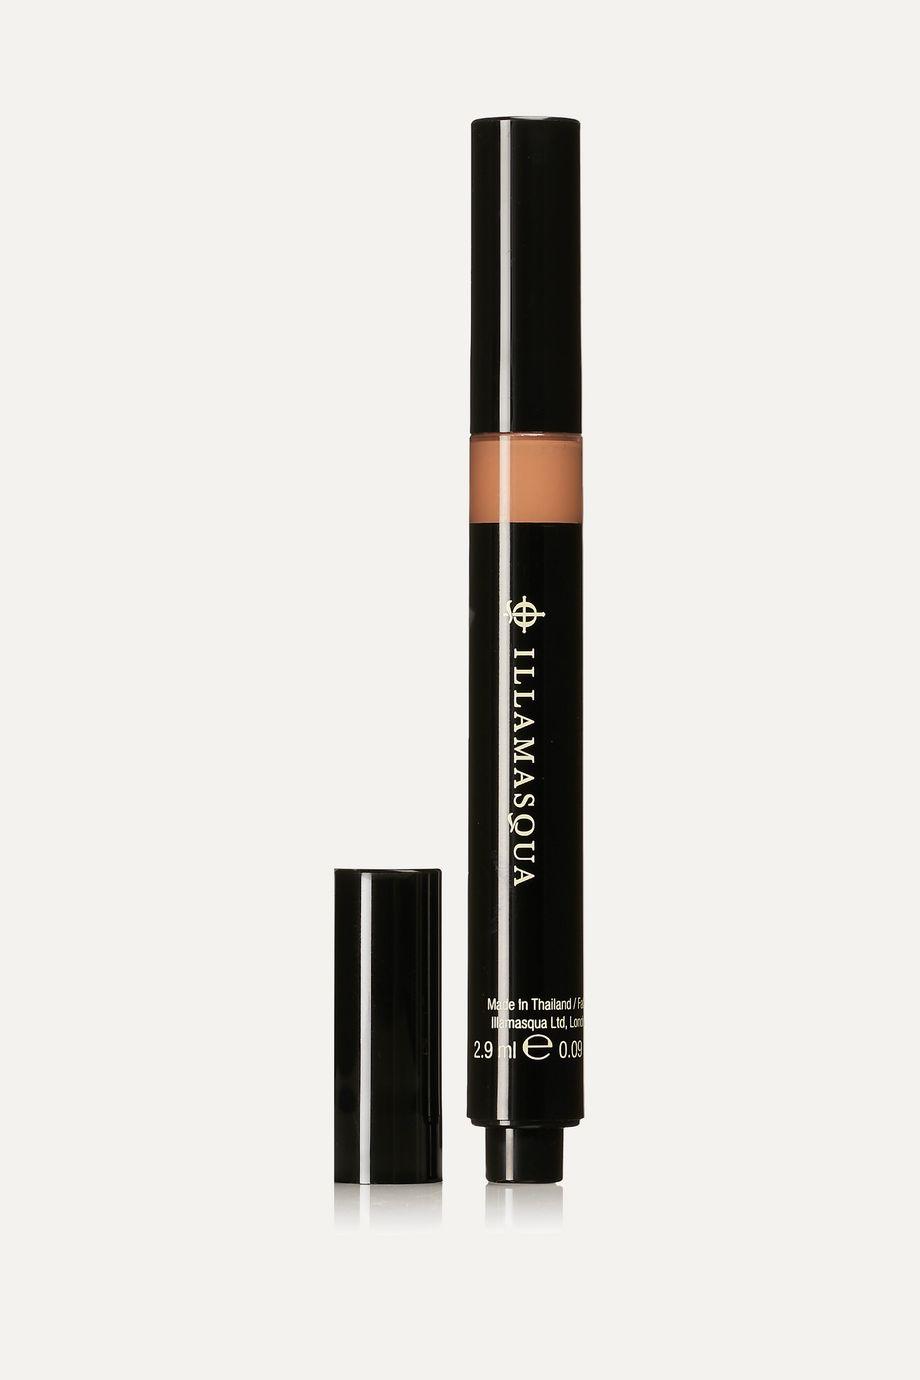 Illamasqua Skin Base Concealer Pen - Dark 2